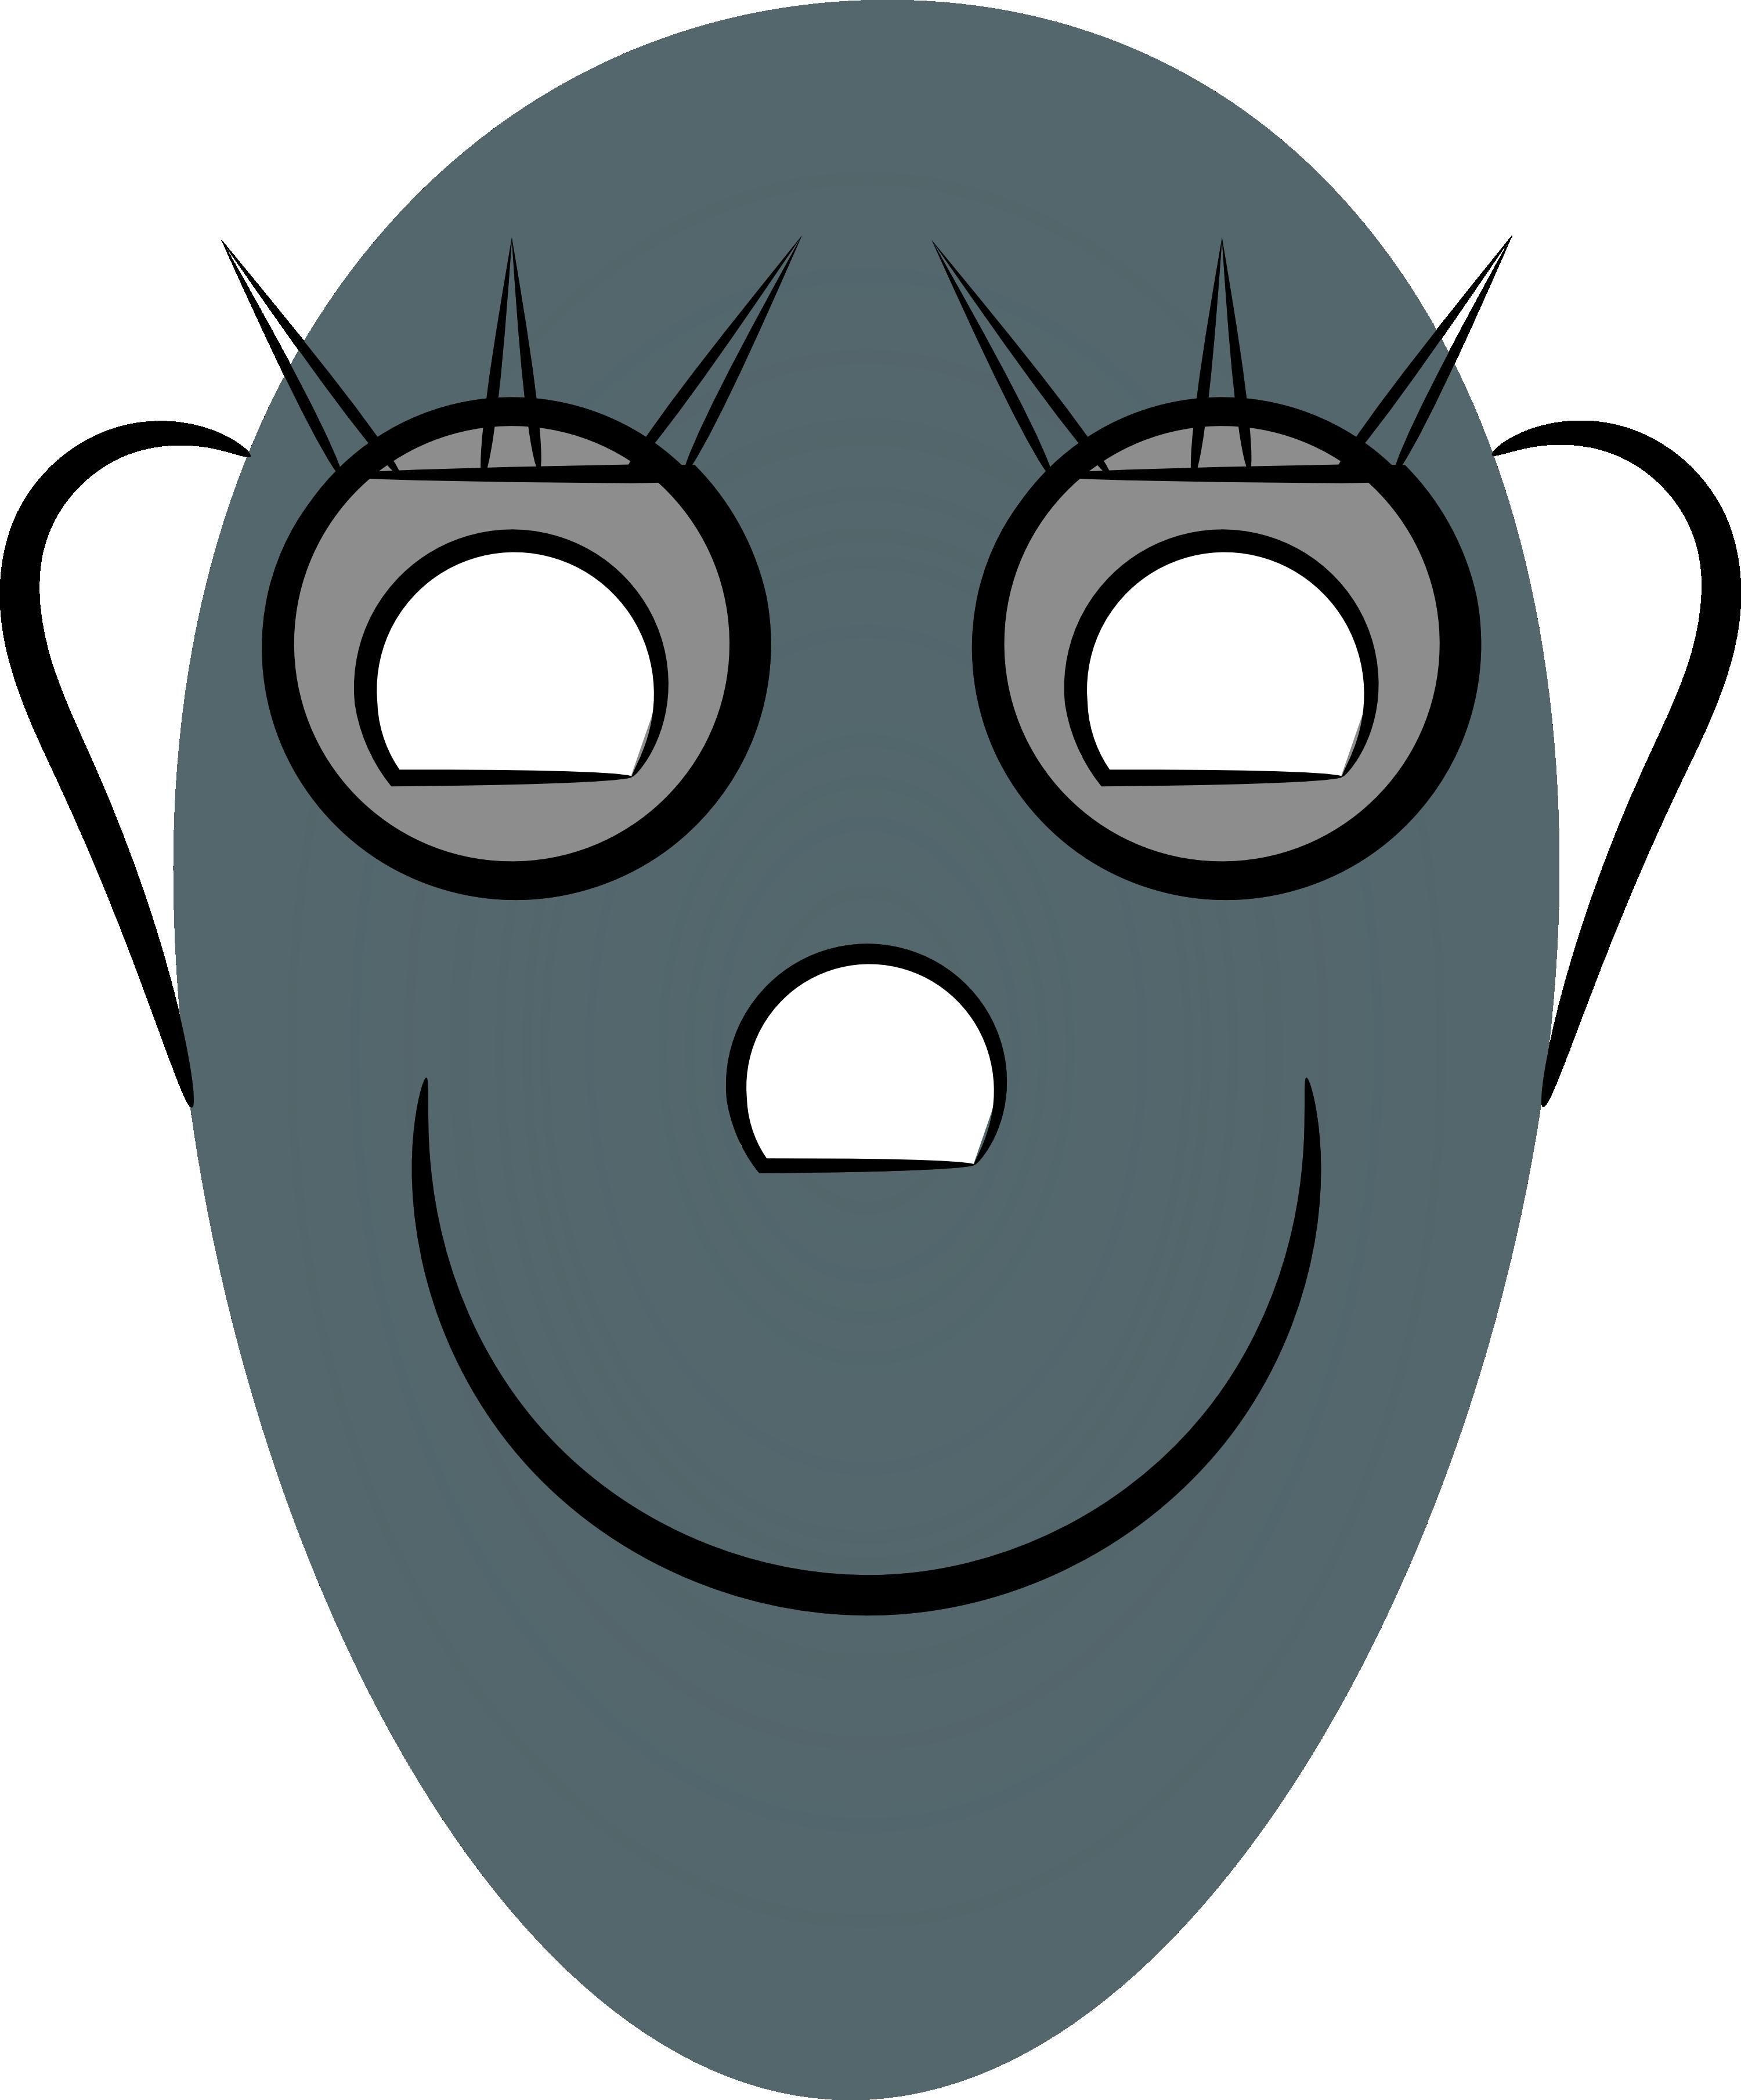 Robot Face Image.